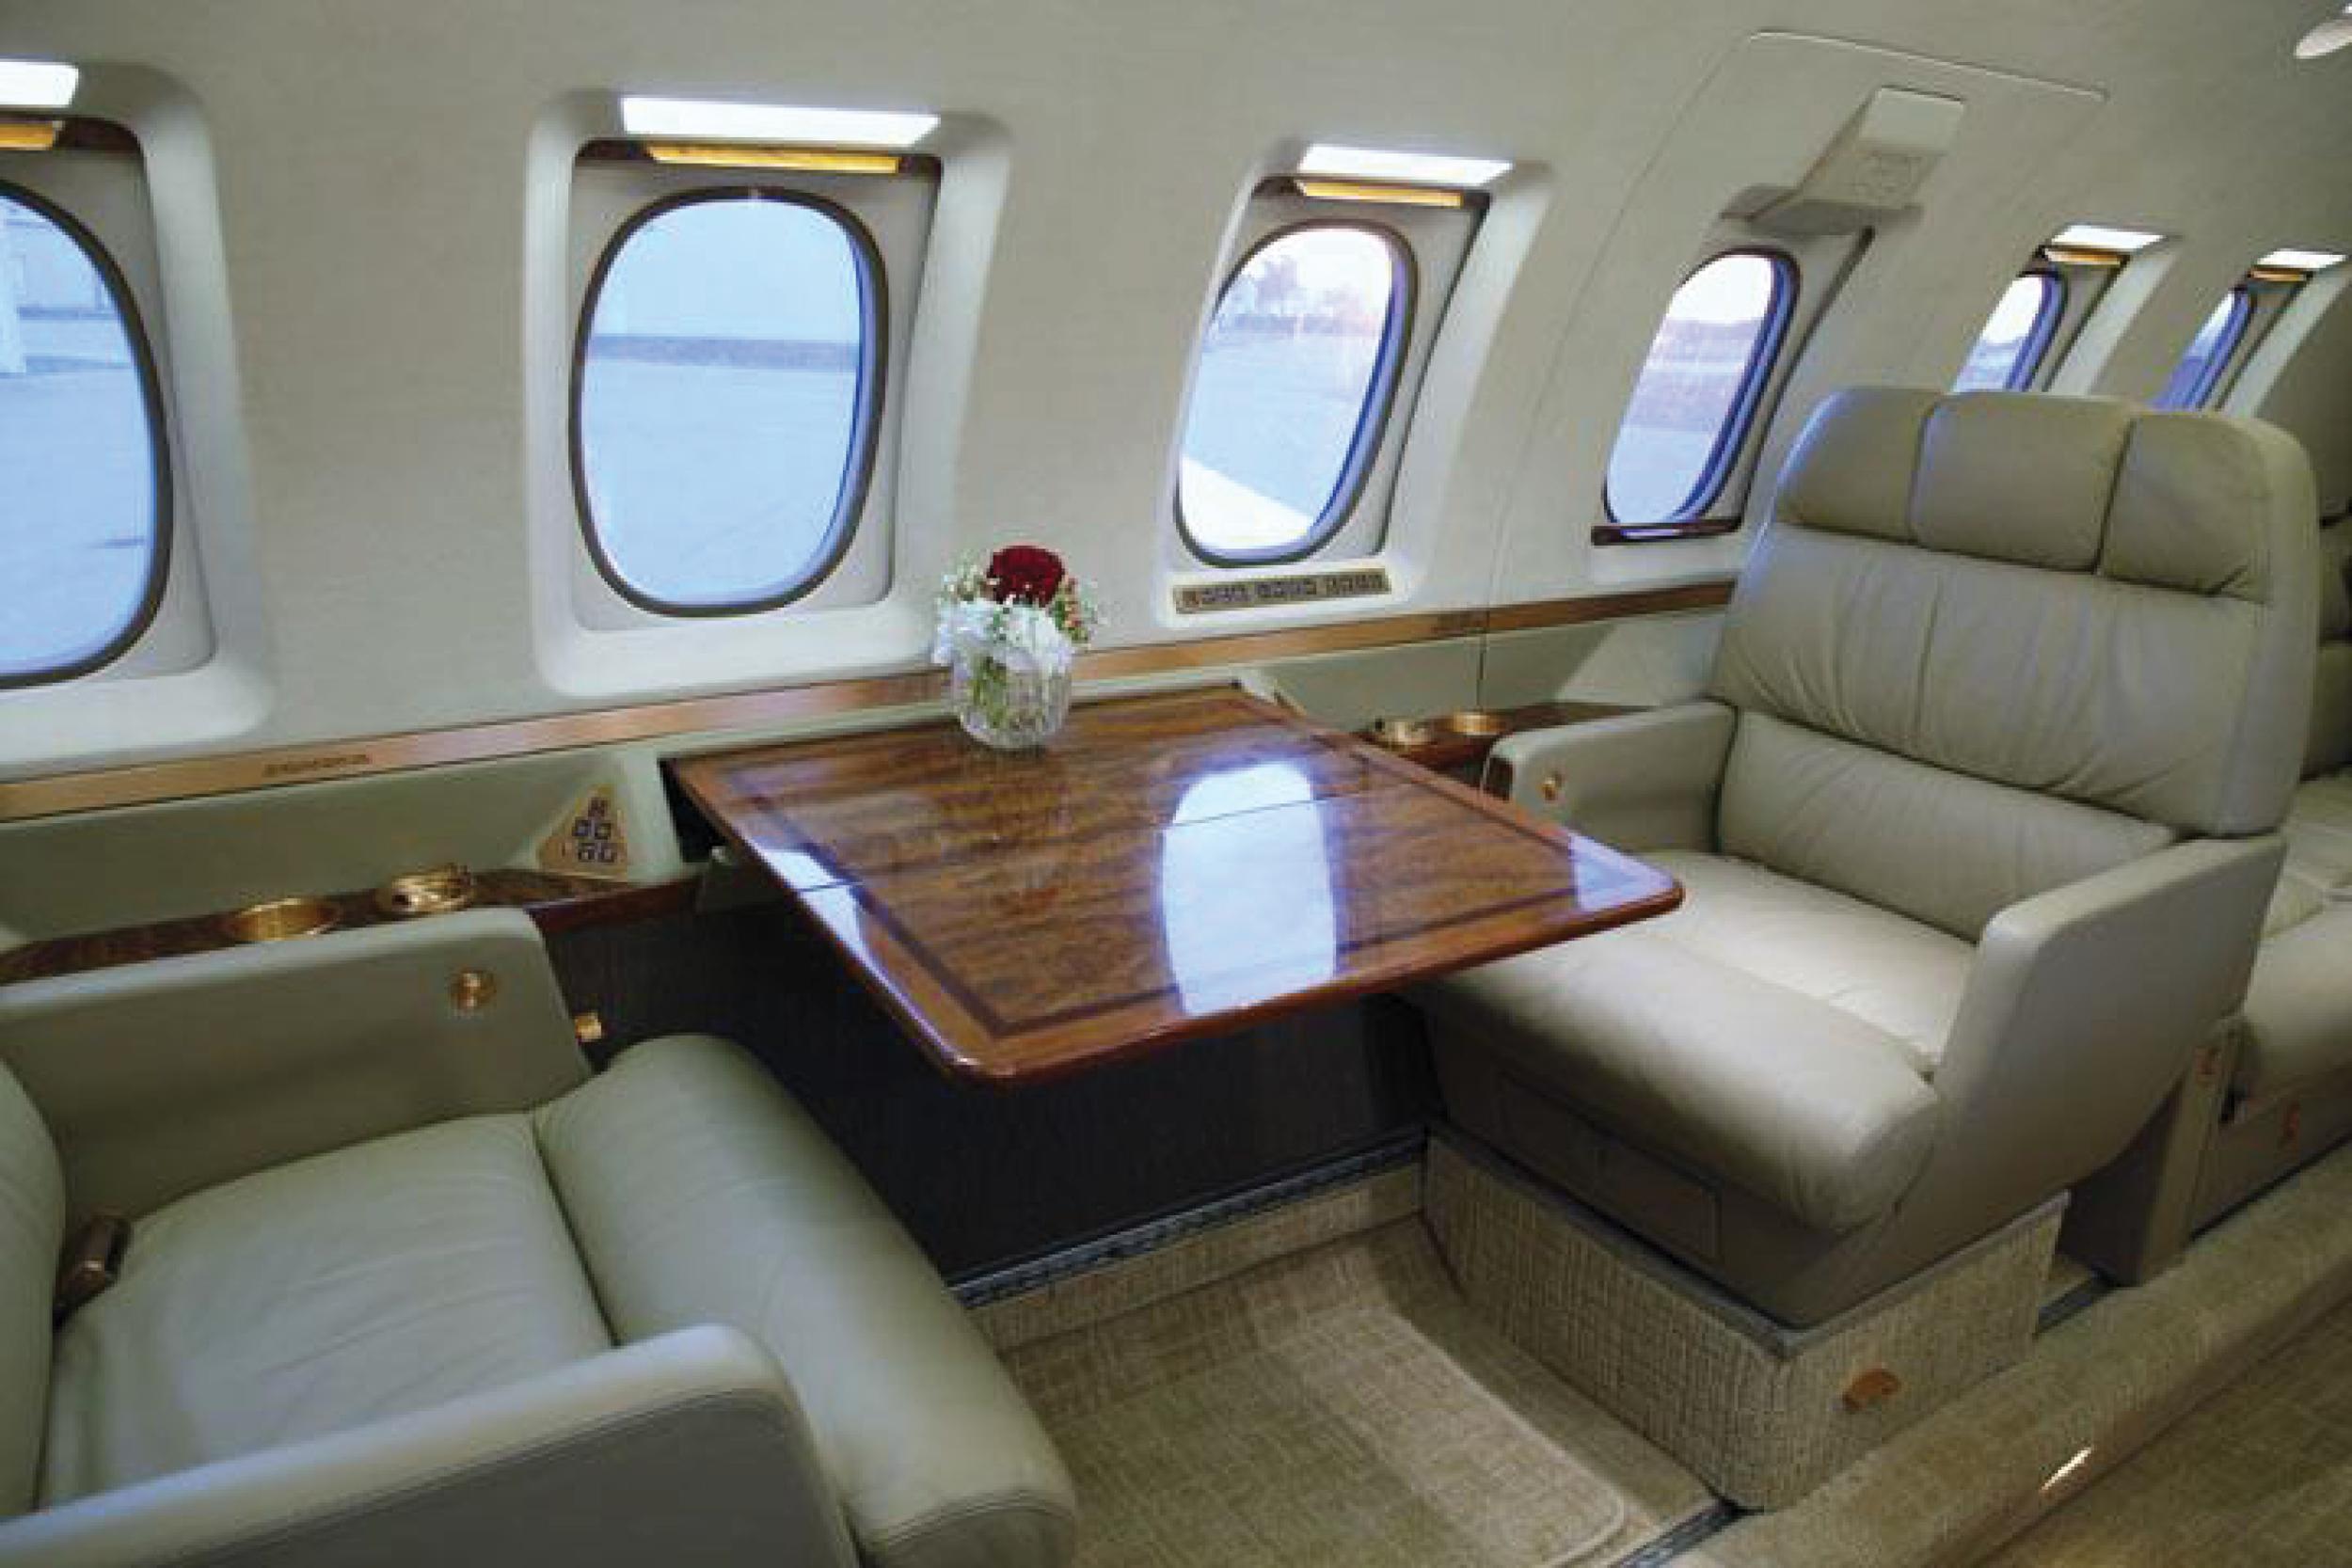 hawker_interior2.jpg